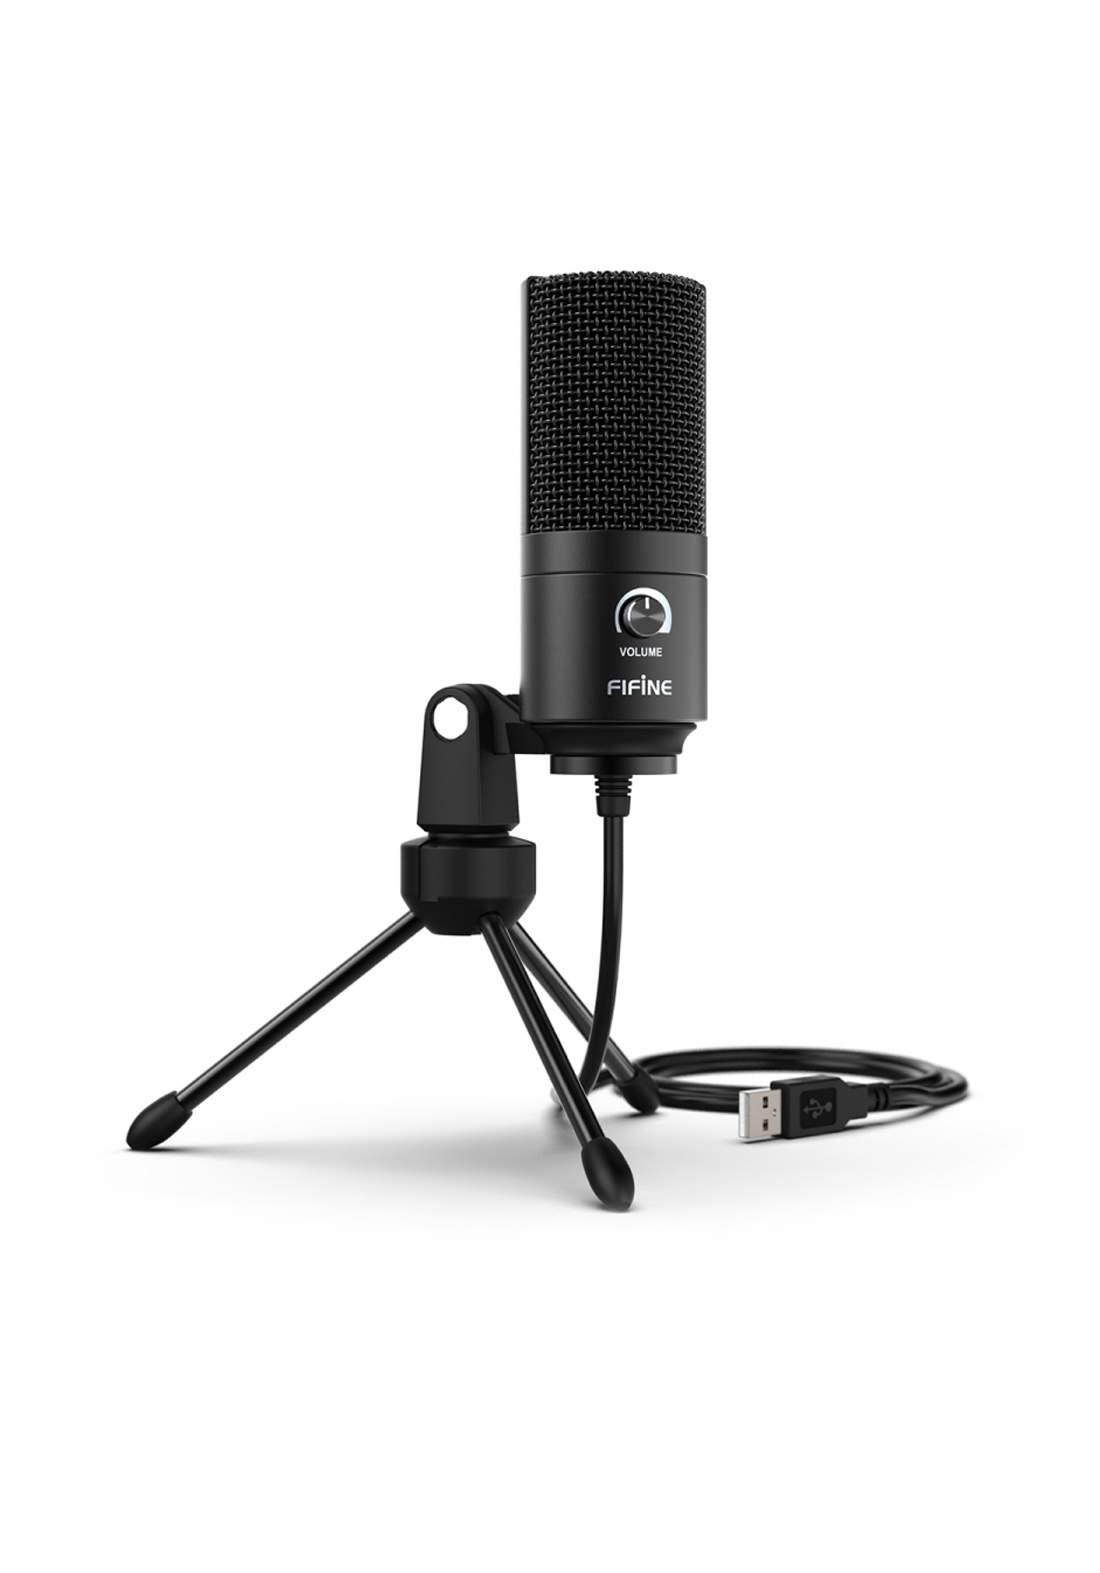 Fifine K669B USB Wired Audio Microphone - Black مايكروفون